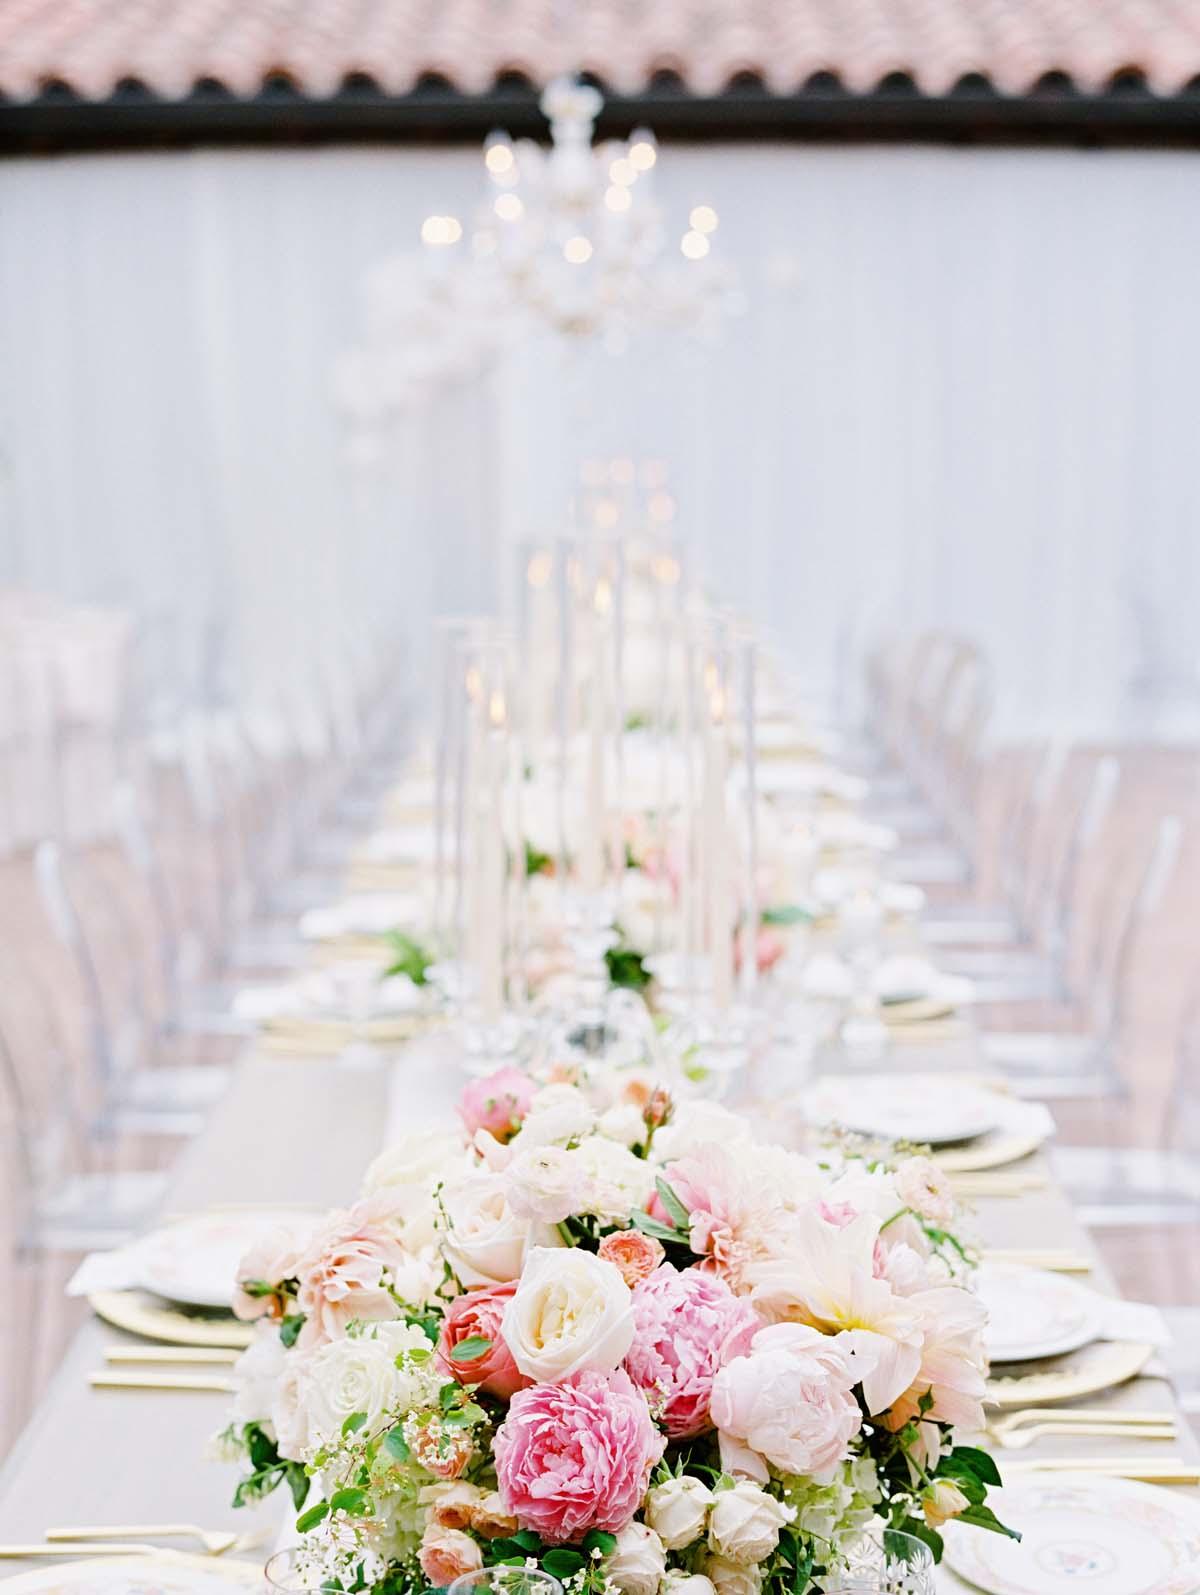 XOXO-BRIDE-Events_Michael-Anna-Costa-Photography-0148